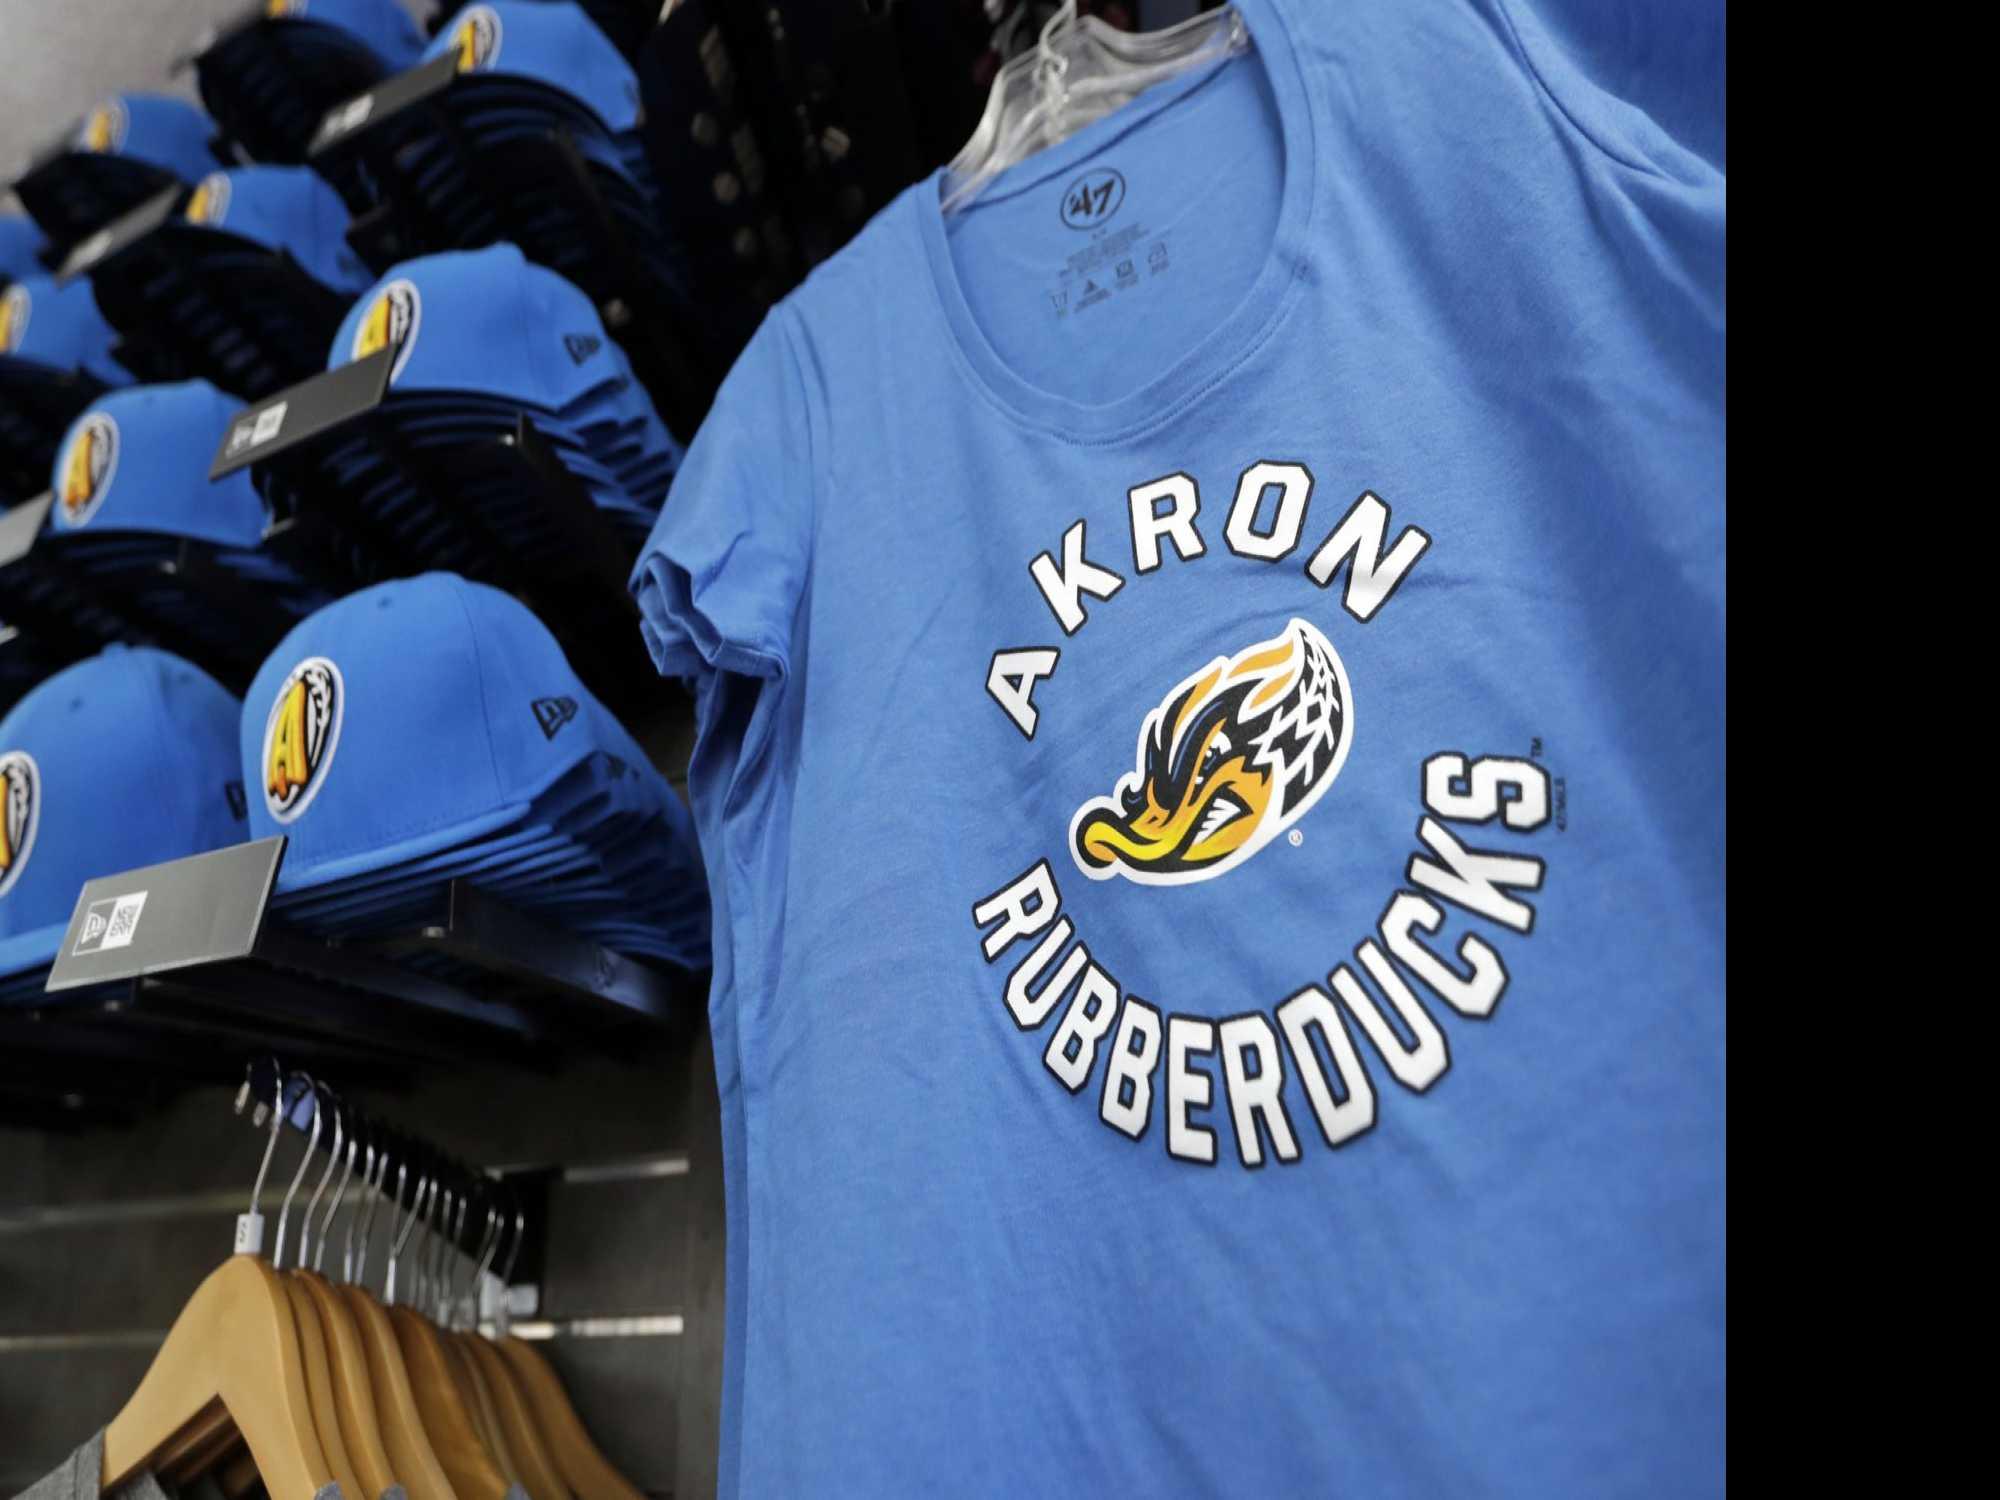 A Baseball Branding Bonanza, and 2 Guys Helping It Happen